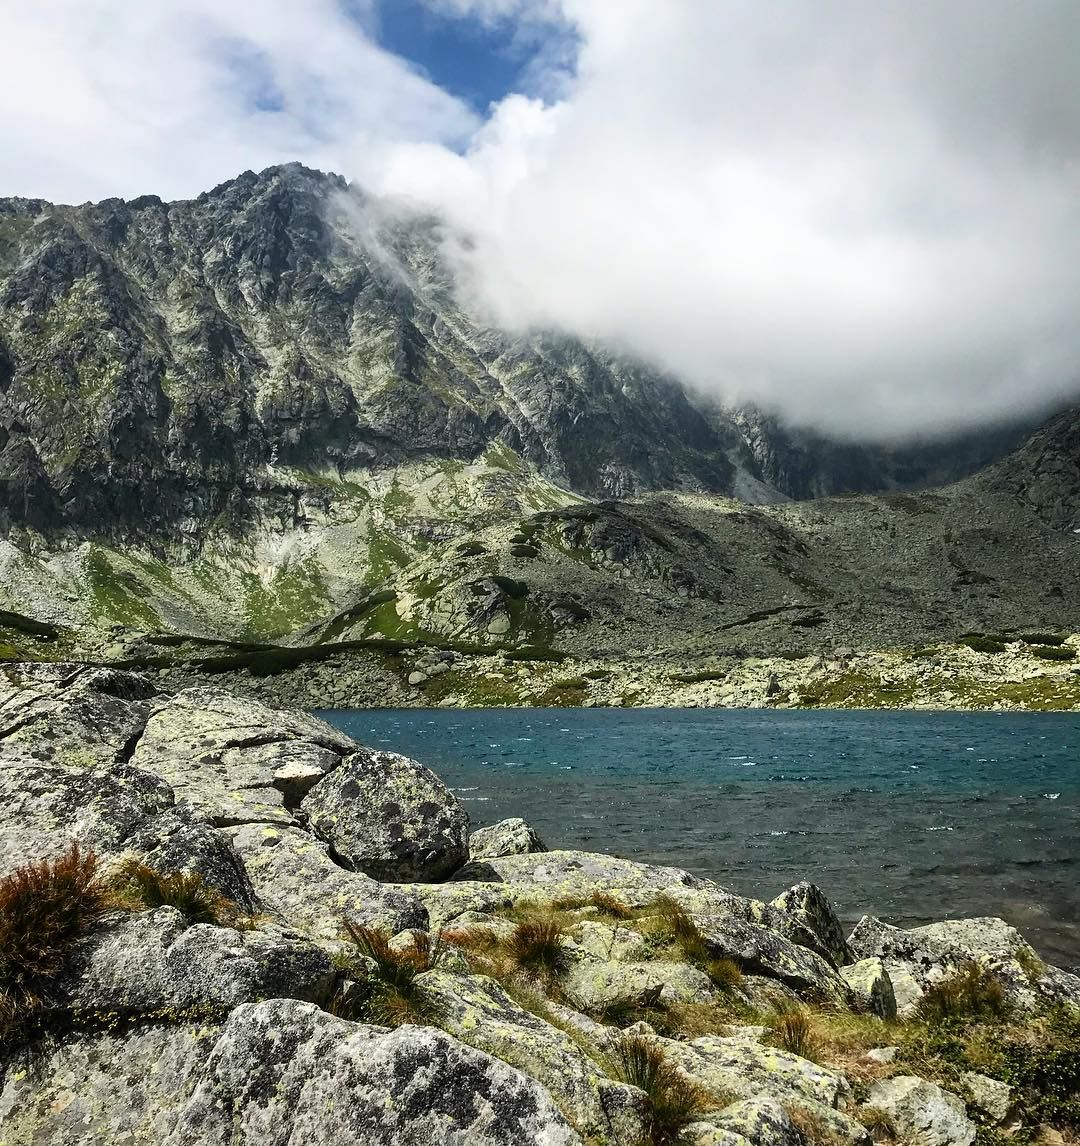 Beauties of Slovakia  #slovakianature #outdoors #outdoorlife #batizovskepleso #vysoketatry #hightatras #slovakia #ilovenature #naturephotography #outdooradventures #lake #lakephotography #mountains #hiking #pleso #slovensko